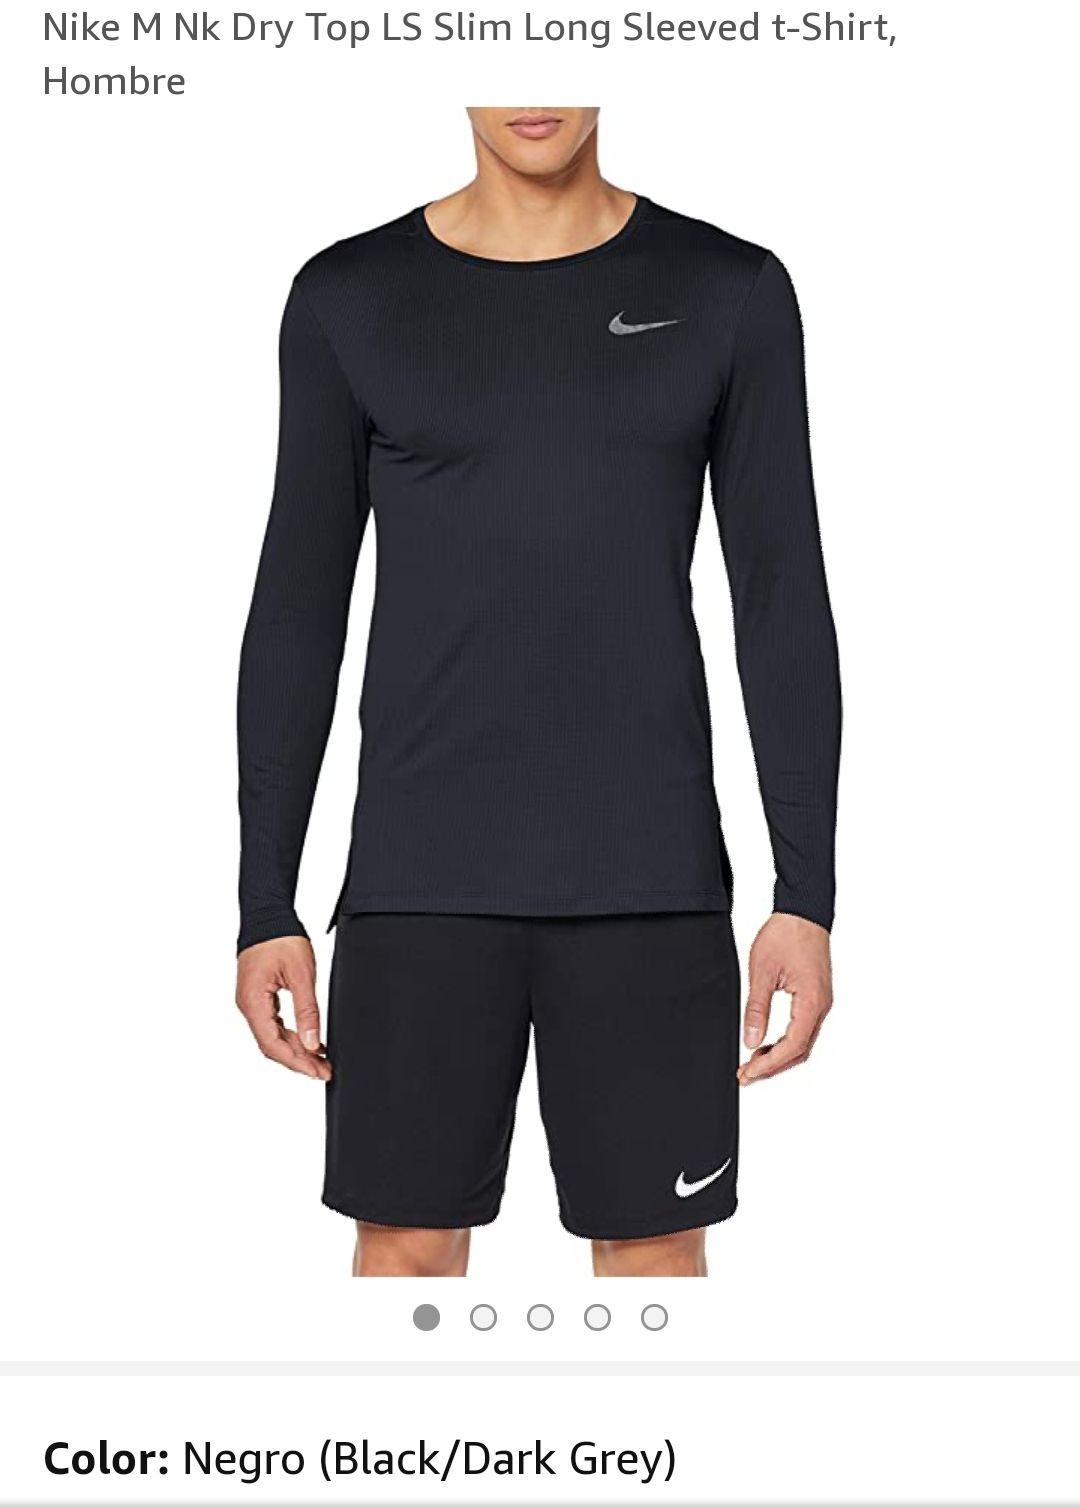 Nike M Nk Dry Top LS Slim Long Sleeved t-Shirt, Hombre